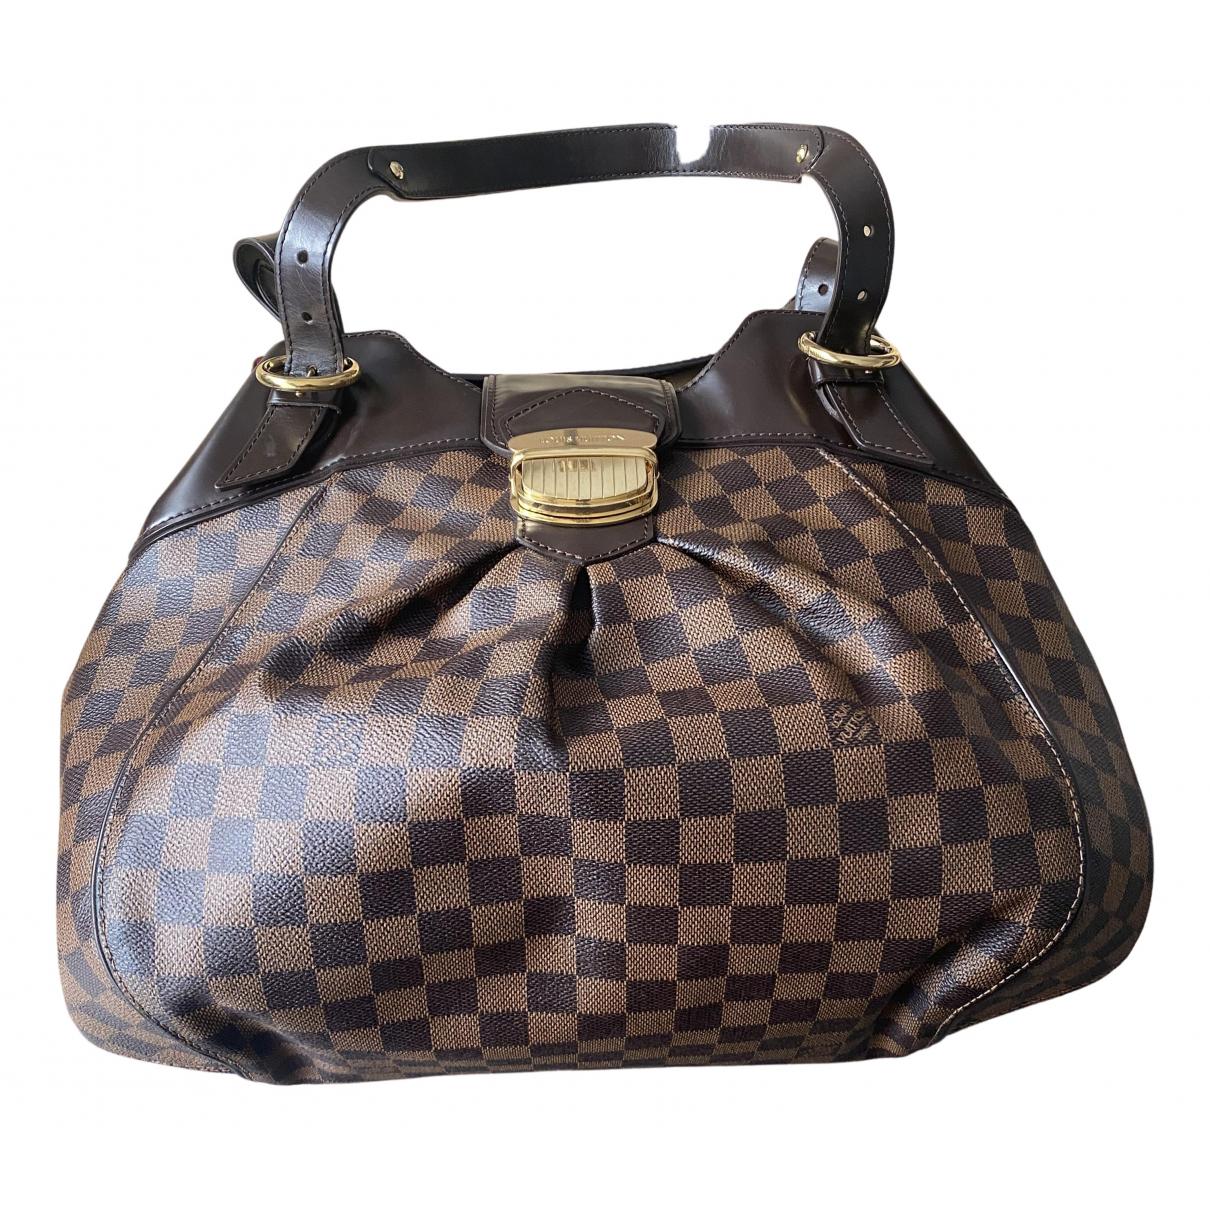 Louis Vuitton - Sac a main Sistina pour femme en toile - marron